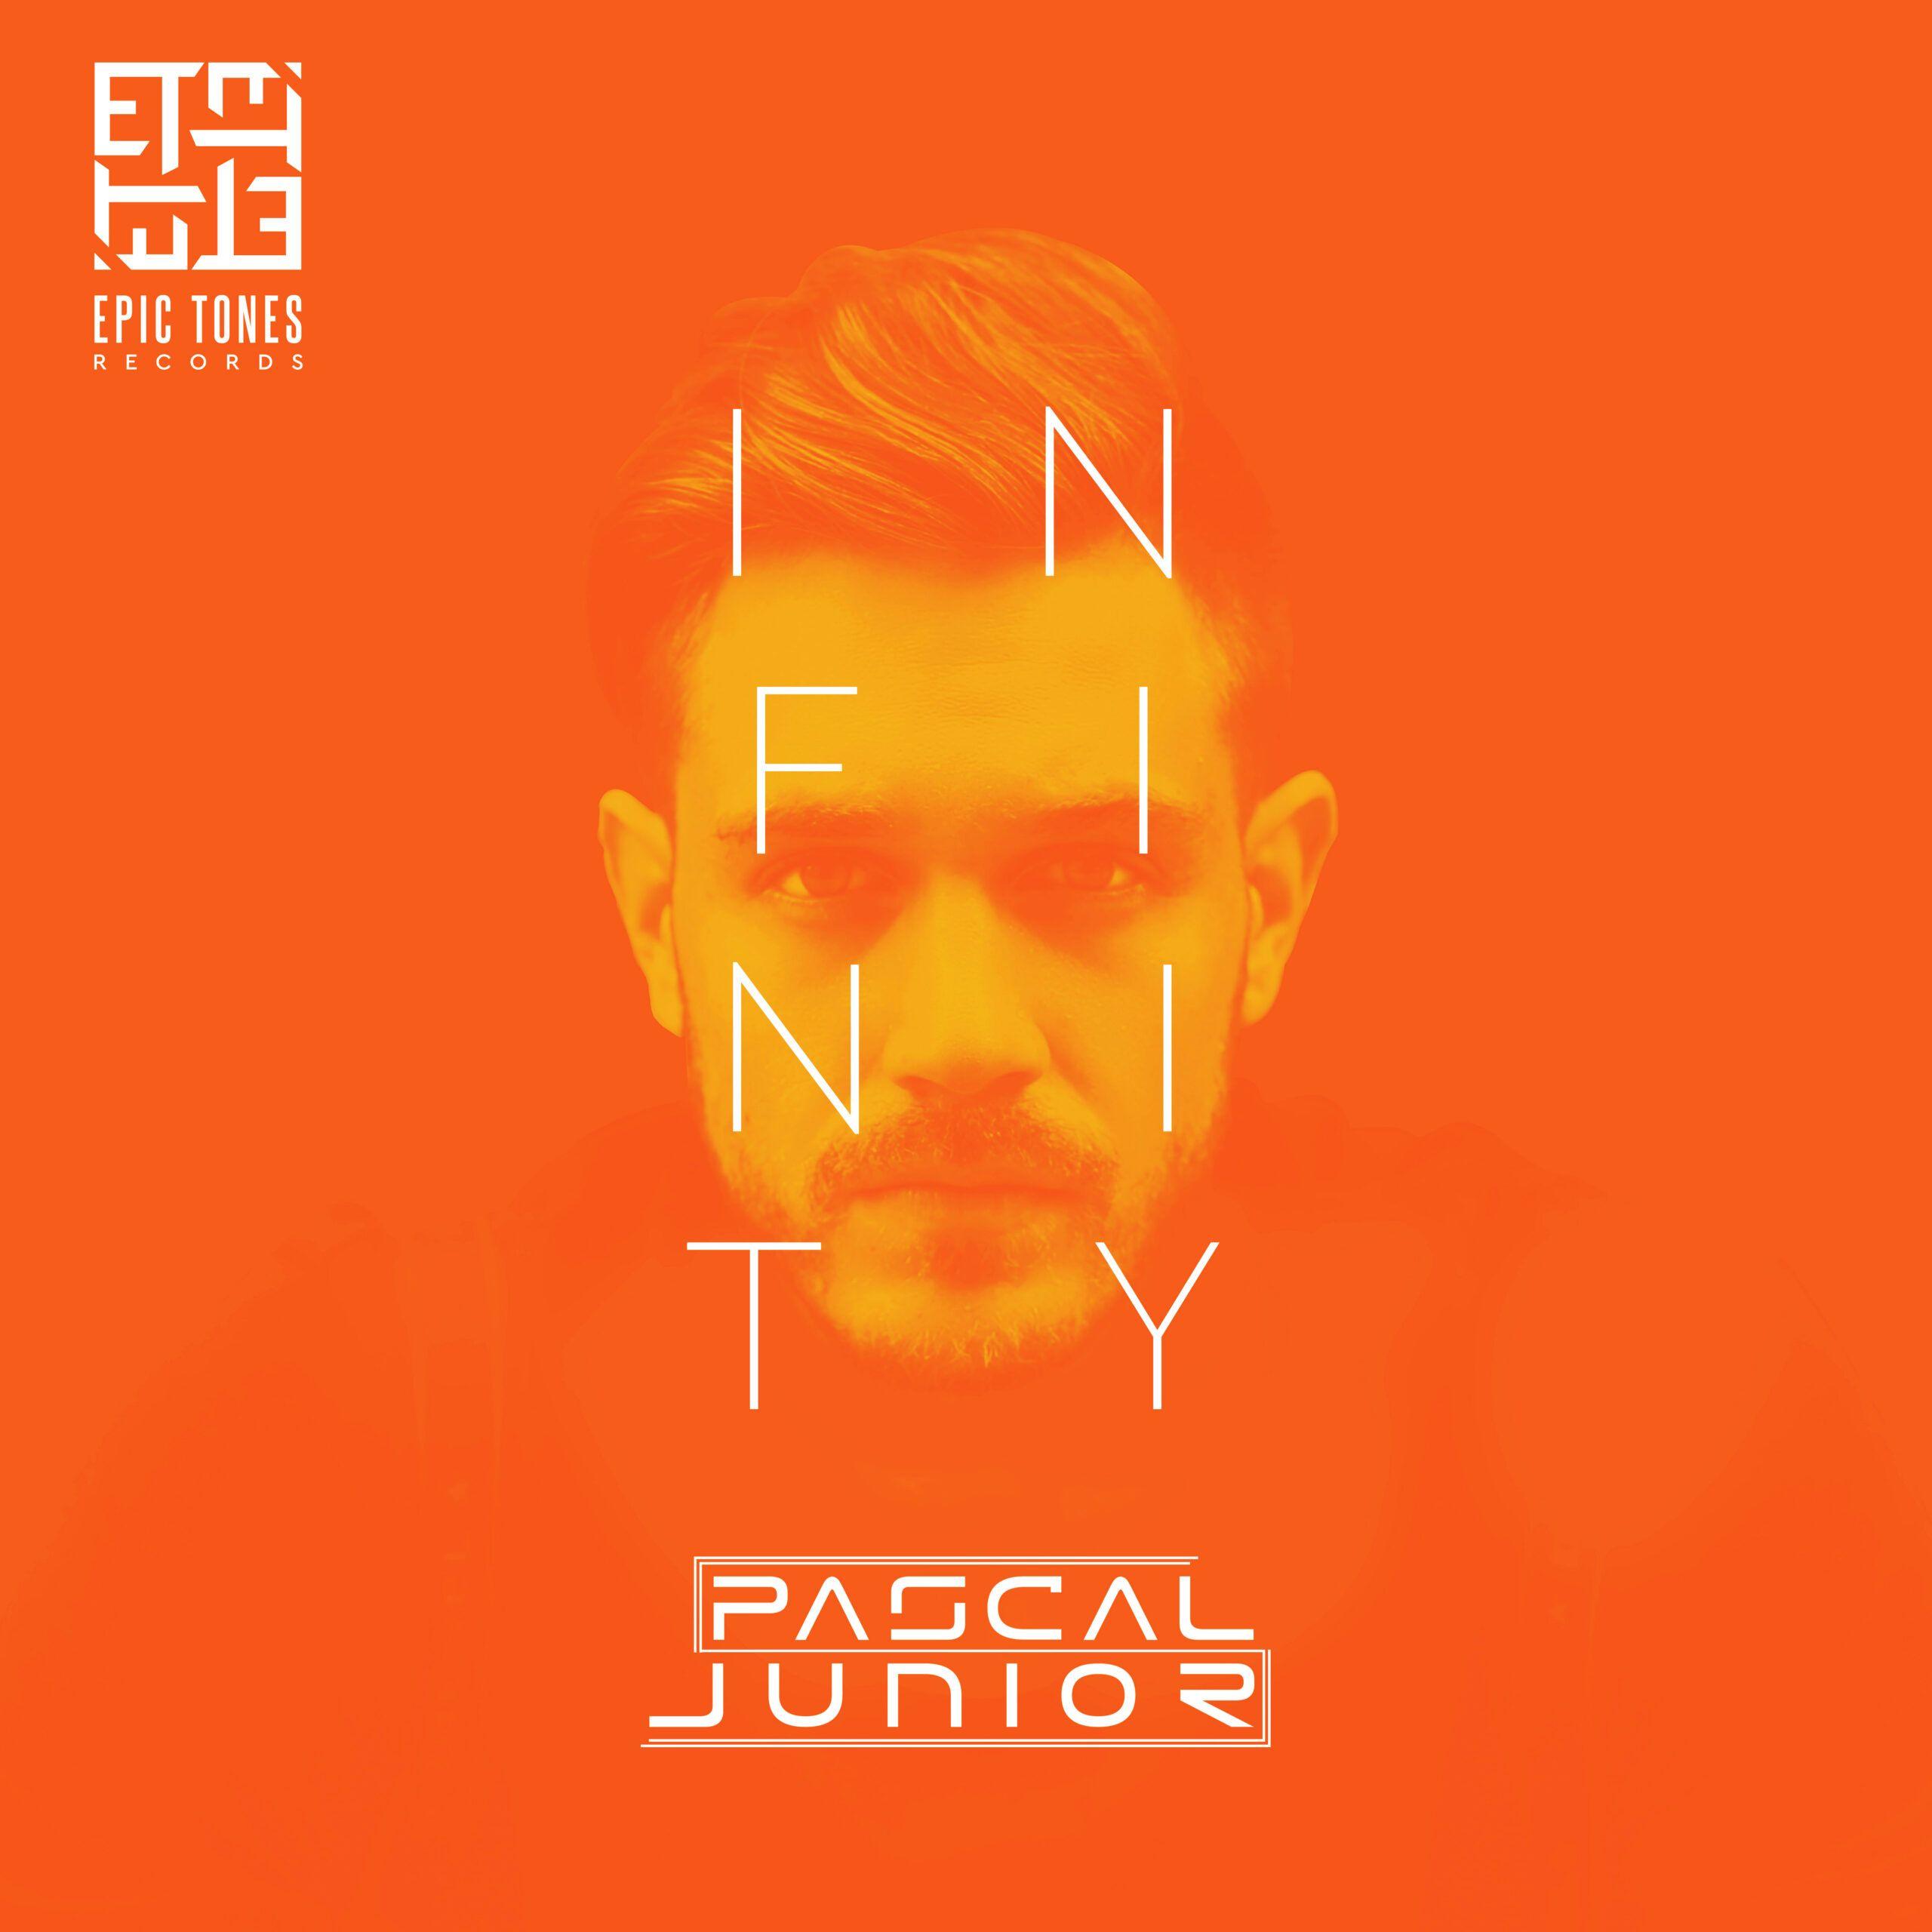 pascal_junior_-_infinity_epic_tones_records.jpg